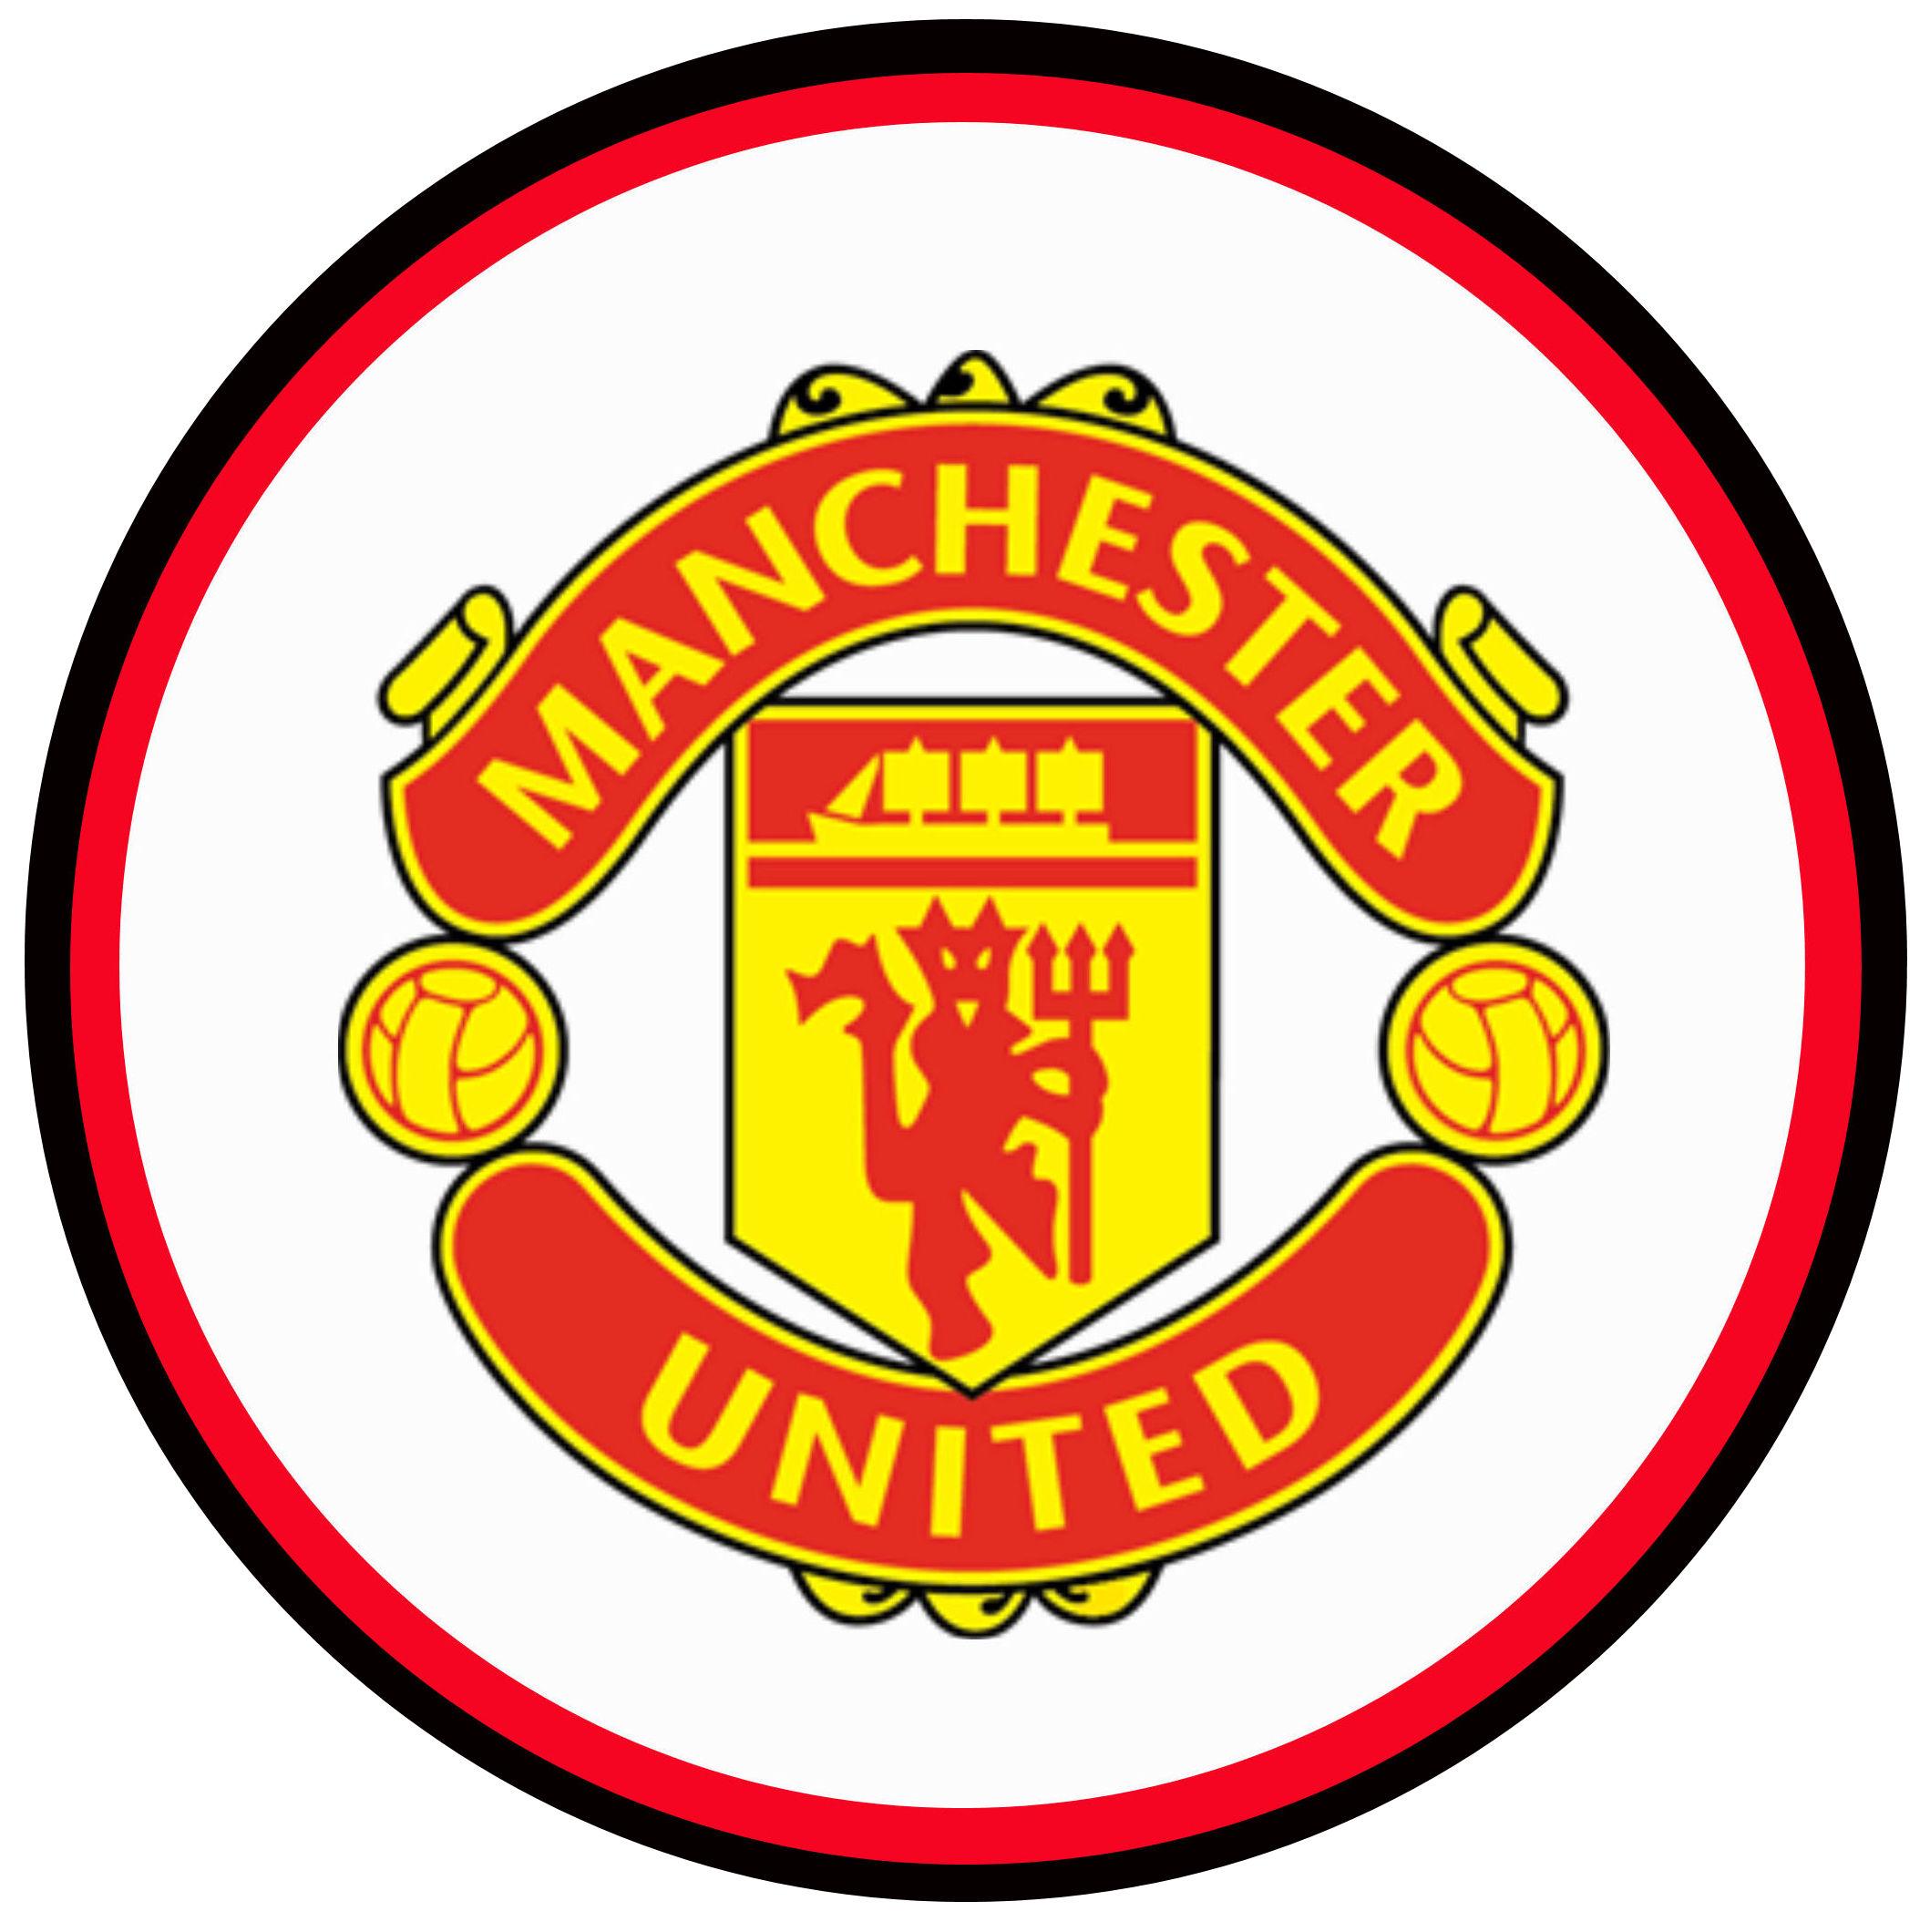 manchester united logo circle cake topper rh wagcakebits co uk logo manchester united dream league soccer logo manchester united kuchalana